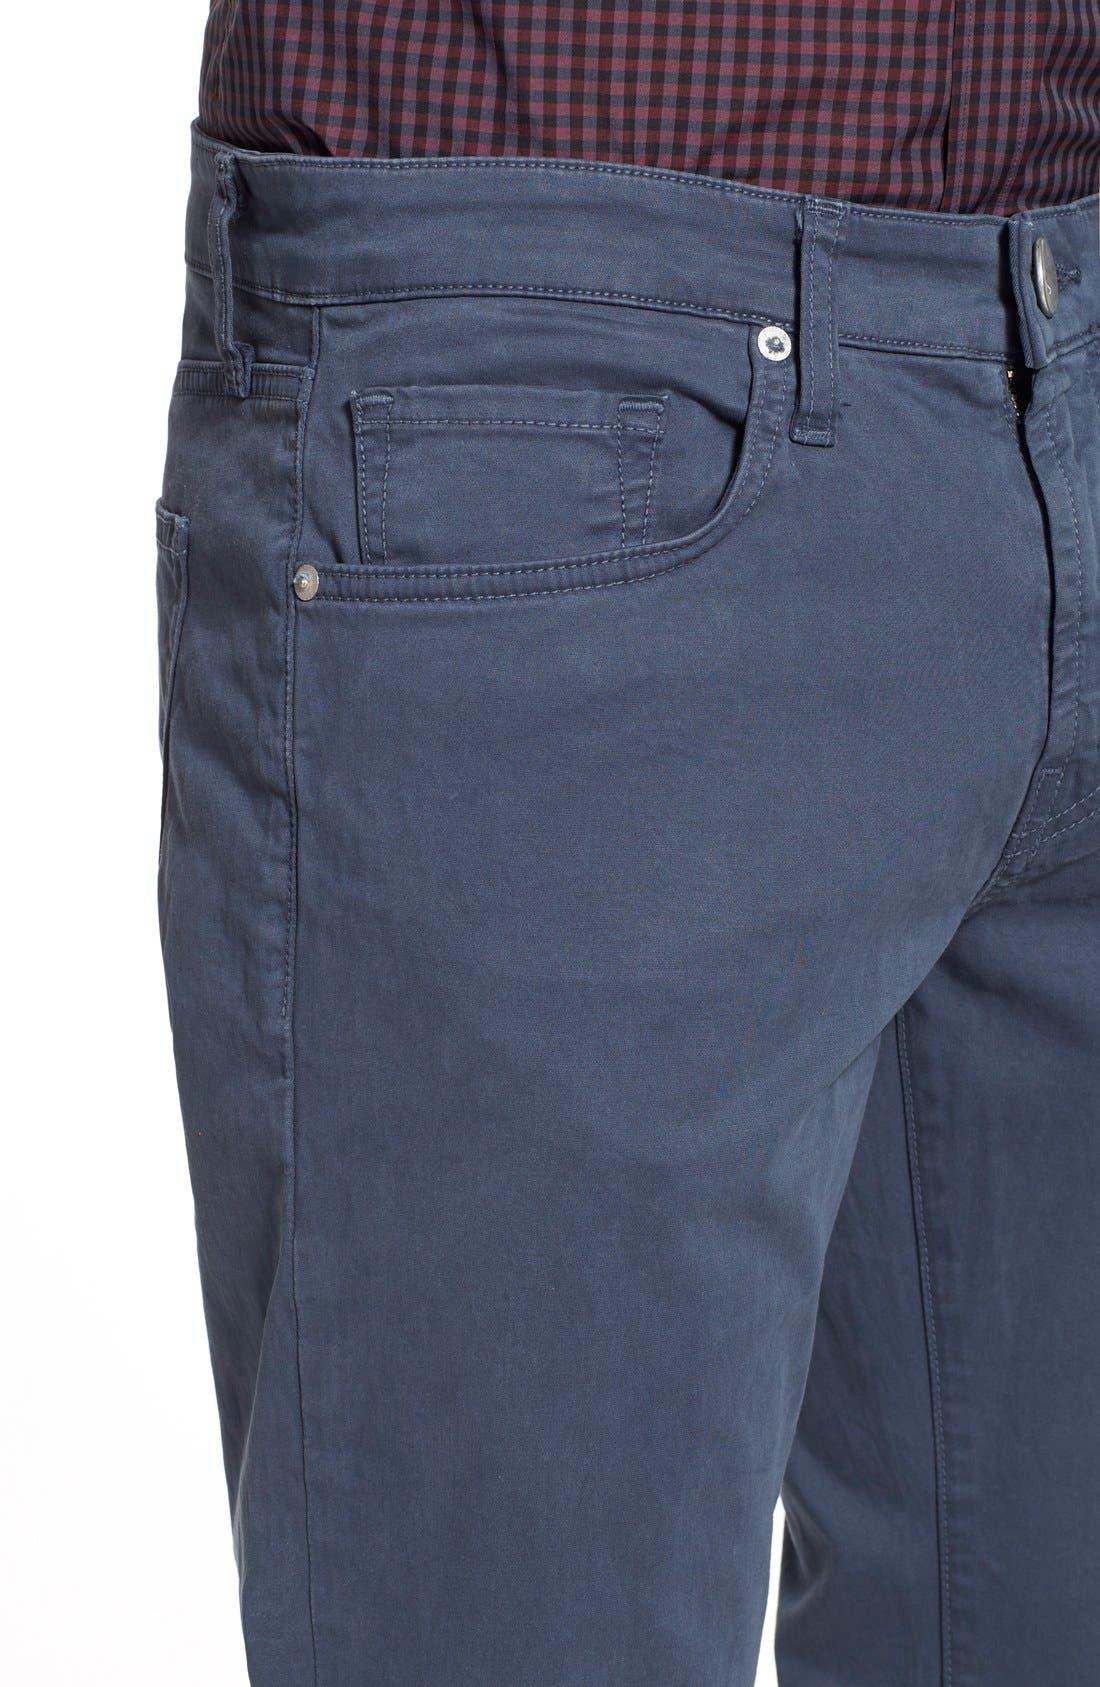 'Kane' Slim Fit Cotton Twill Pants,                             Alternate thumbnail 69, color,